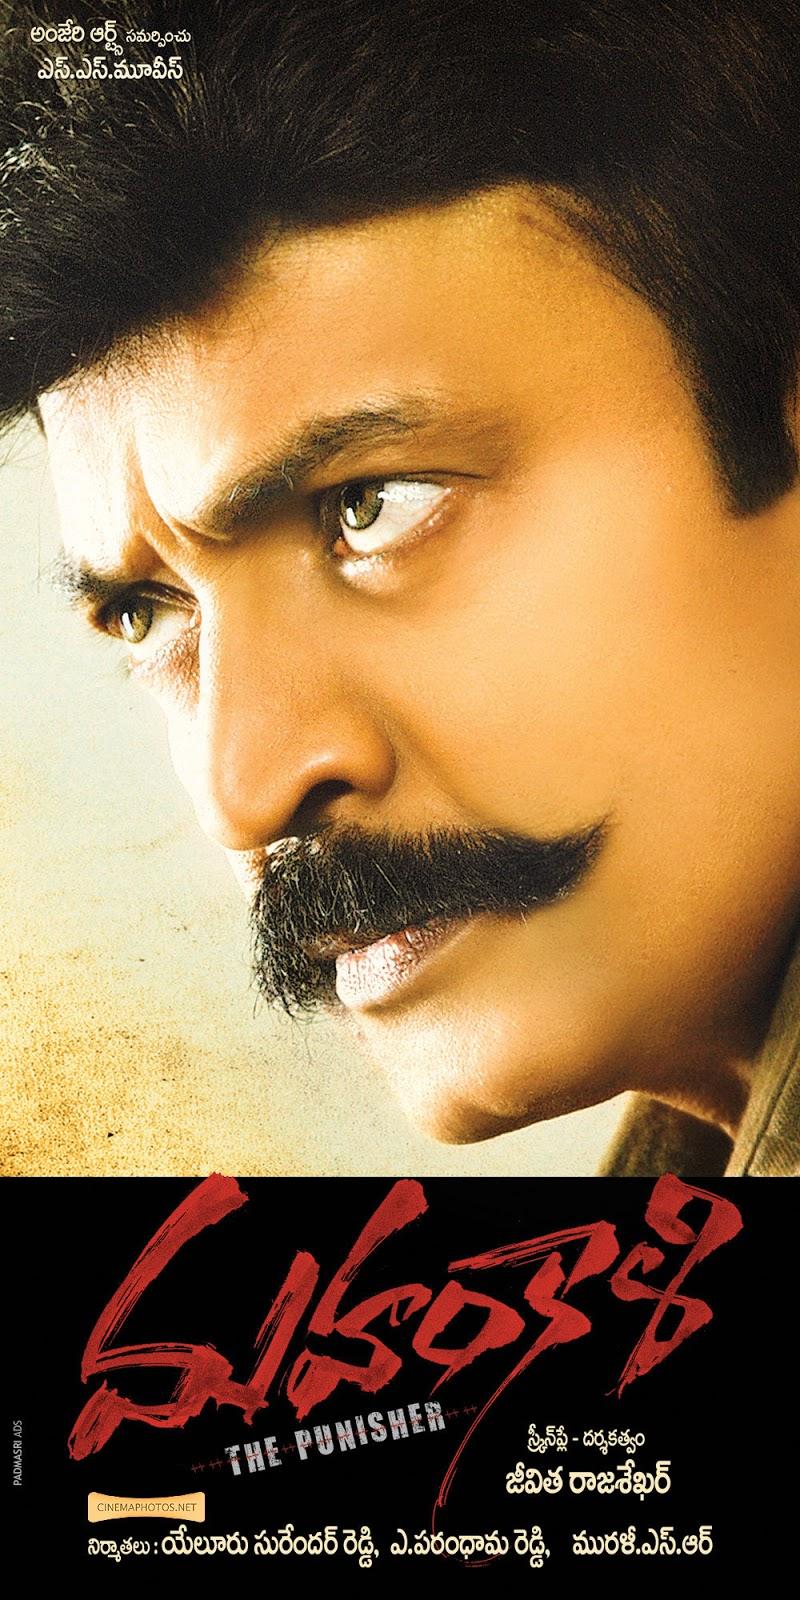 Mahankali 2013 telugu movie hd wallpapers atozallmovie - Telugu hd wallpaper ...